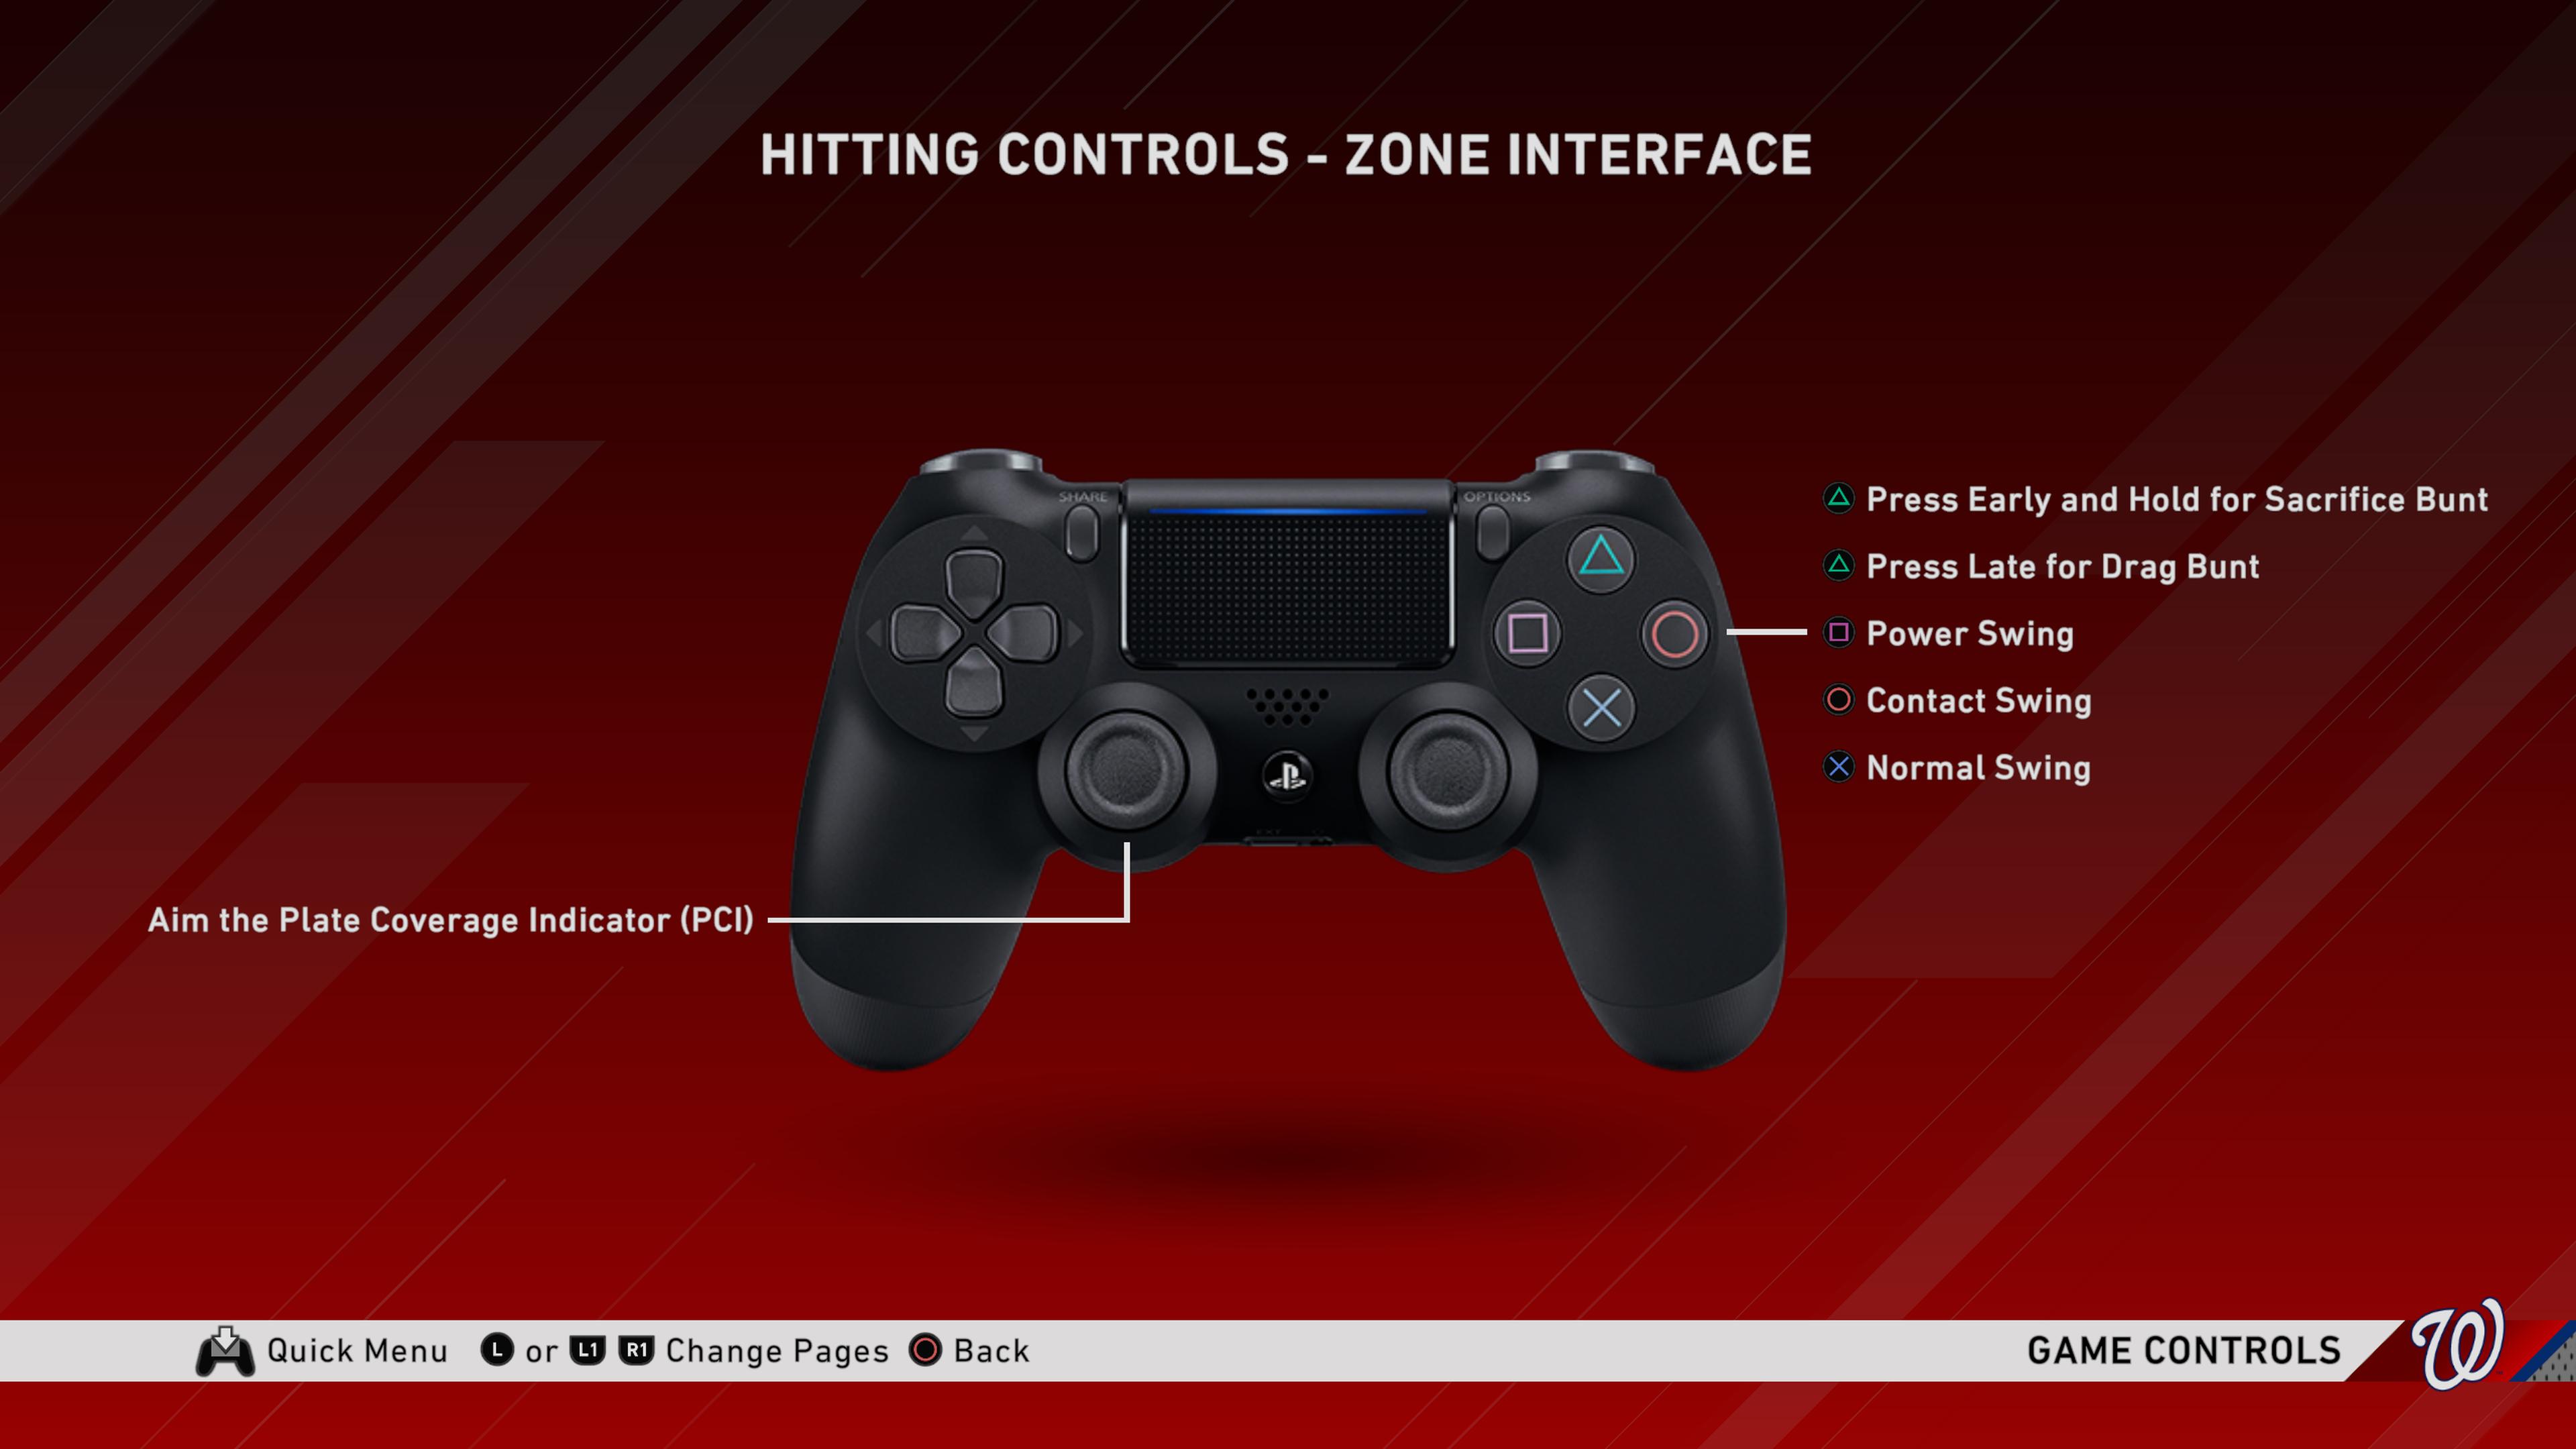 hitting control setting